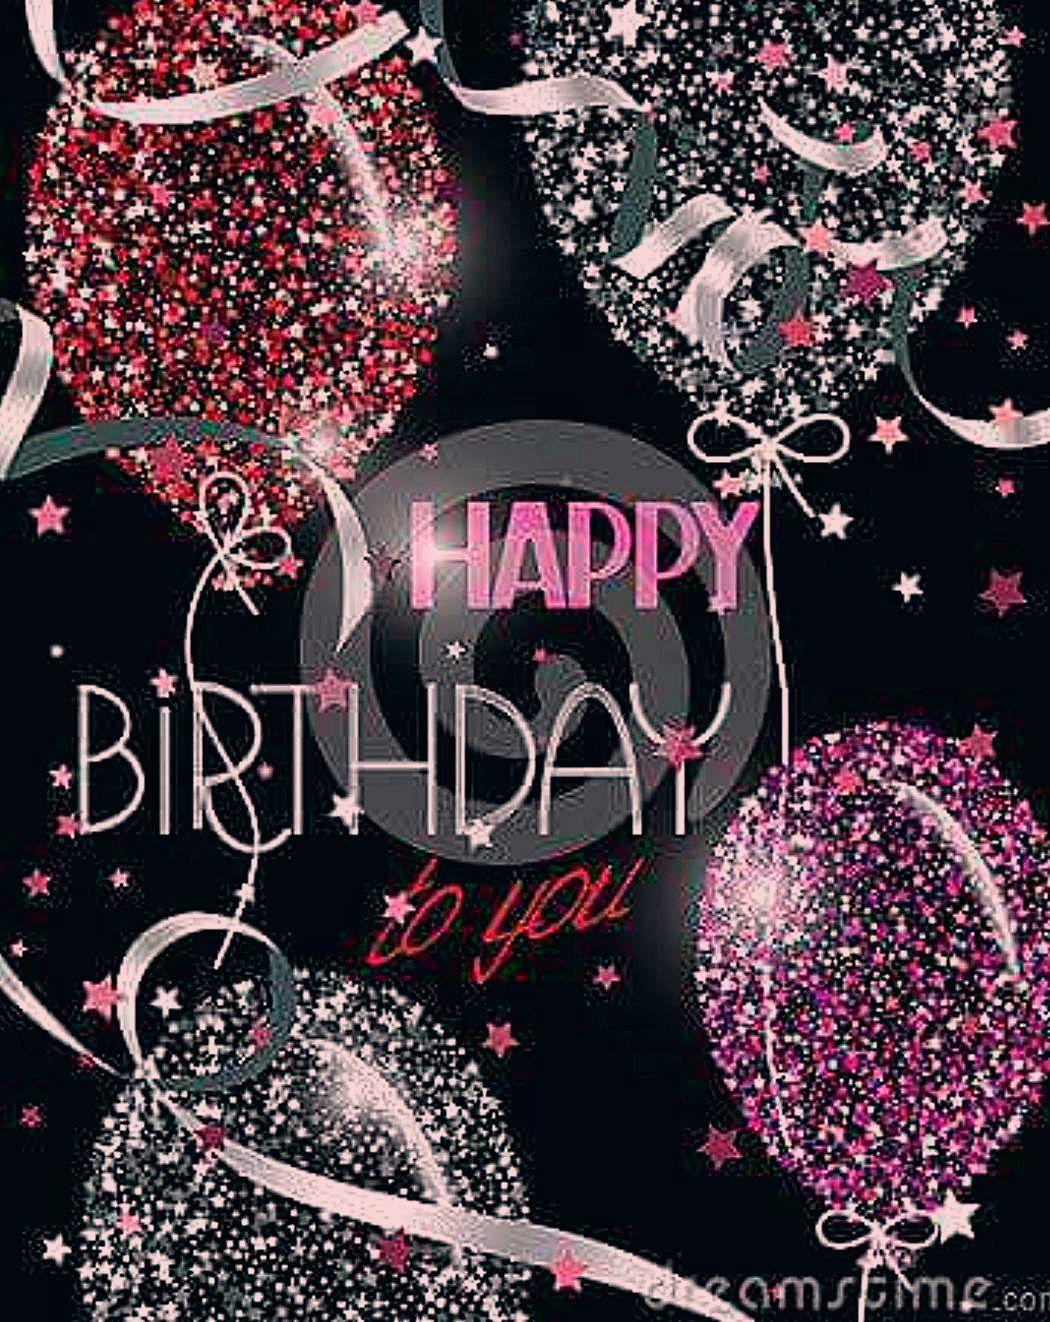 Pin by Rhonda Luettgen on お誕生日 Happy birthday wishes